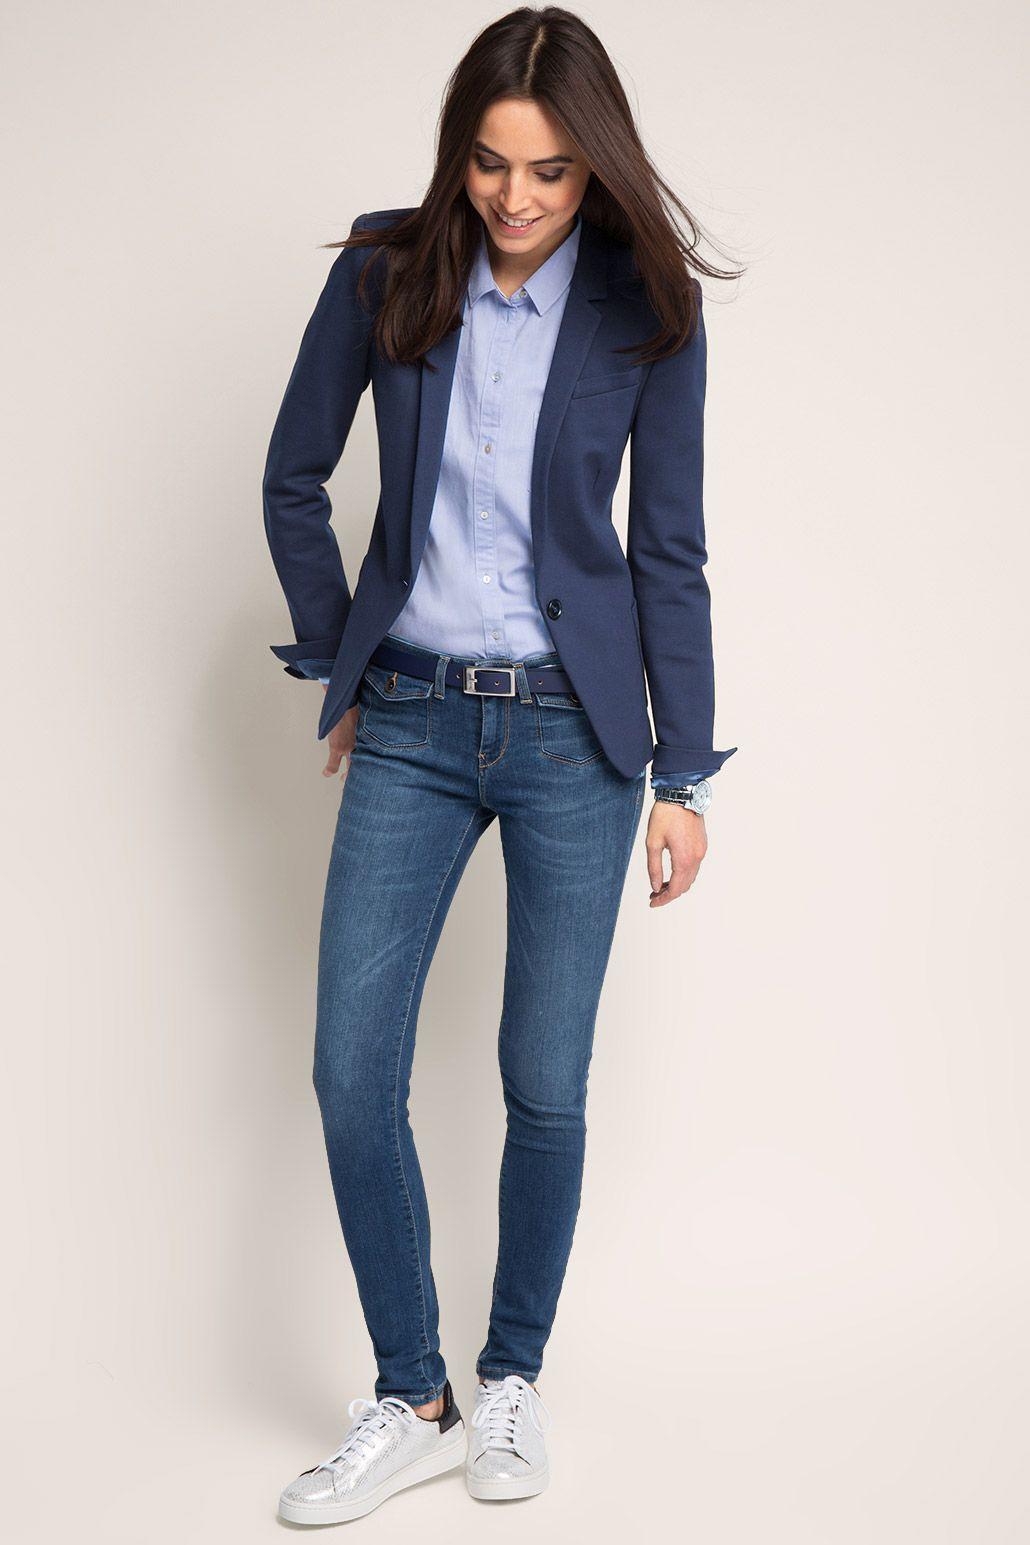 esprit 1 knopf blazer aus glattem material mix im online shop kaufen outfits. Black Bedroom Furniture Sets. Home Design Ideas